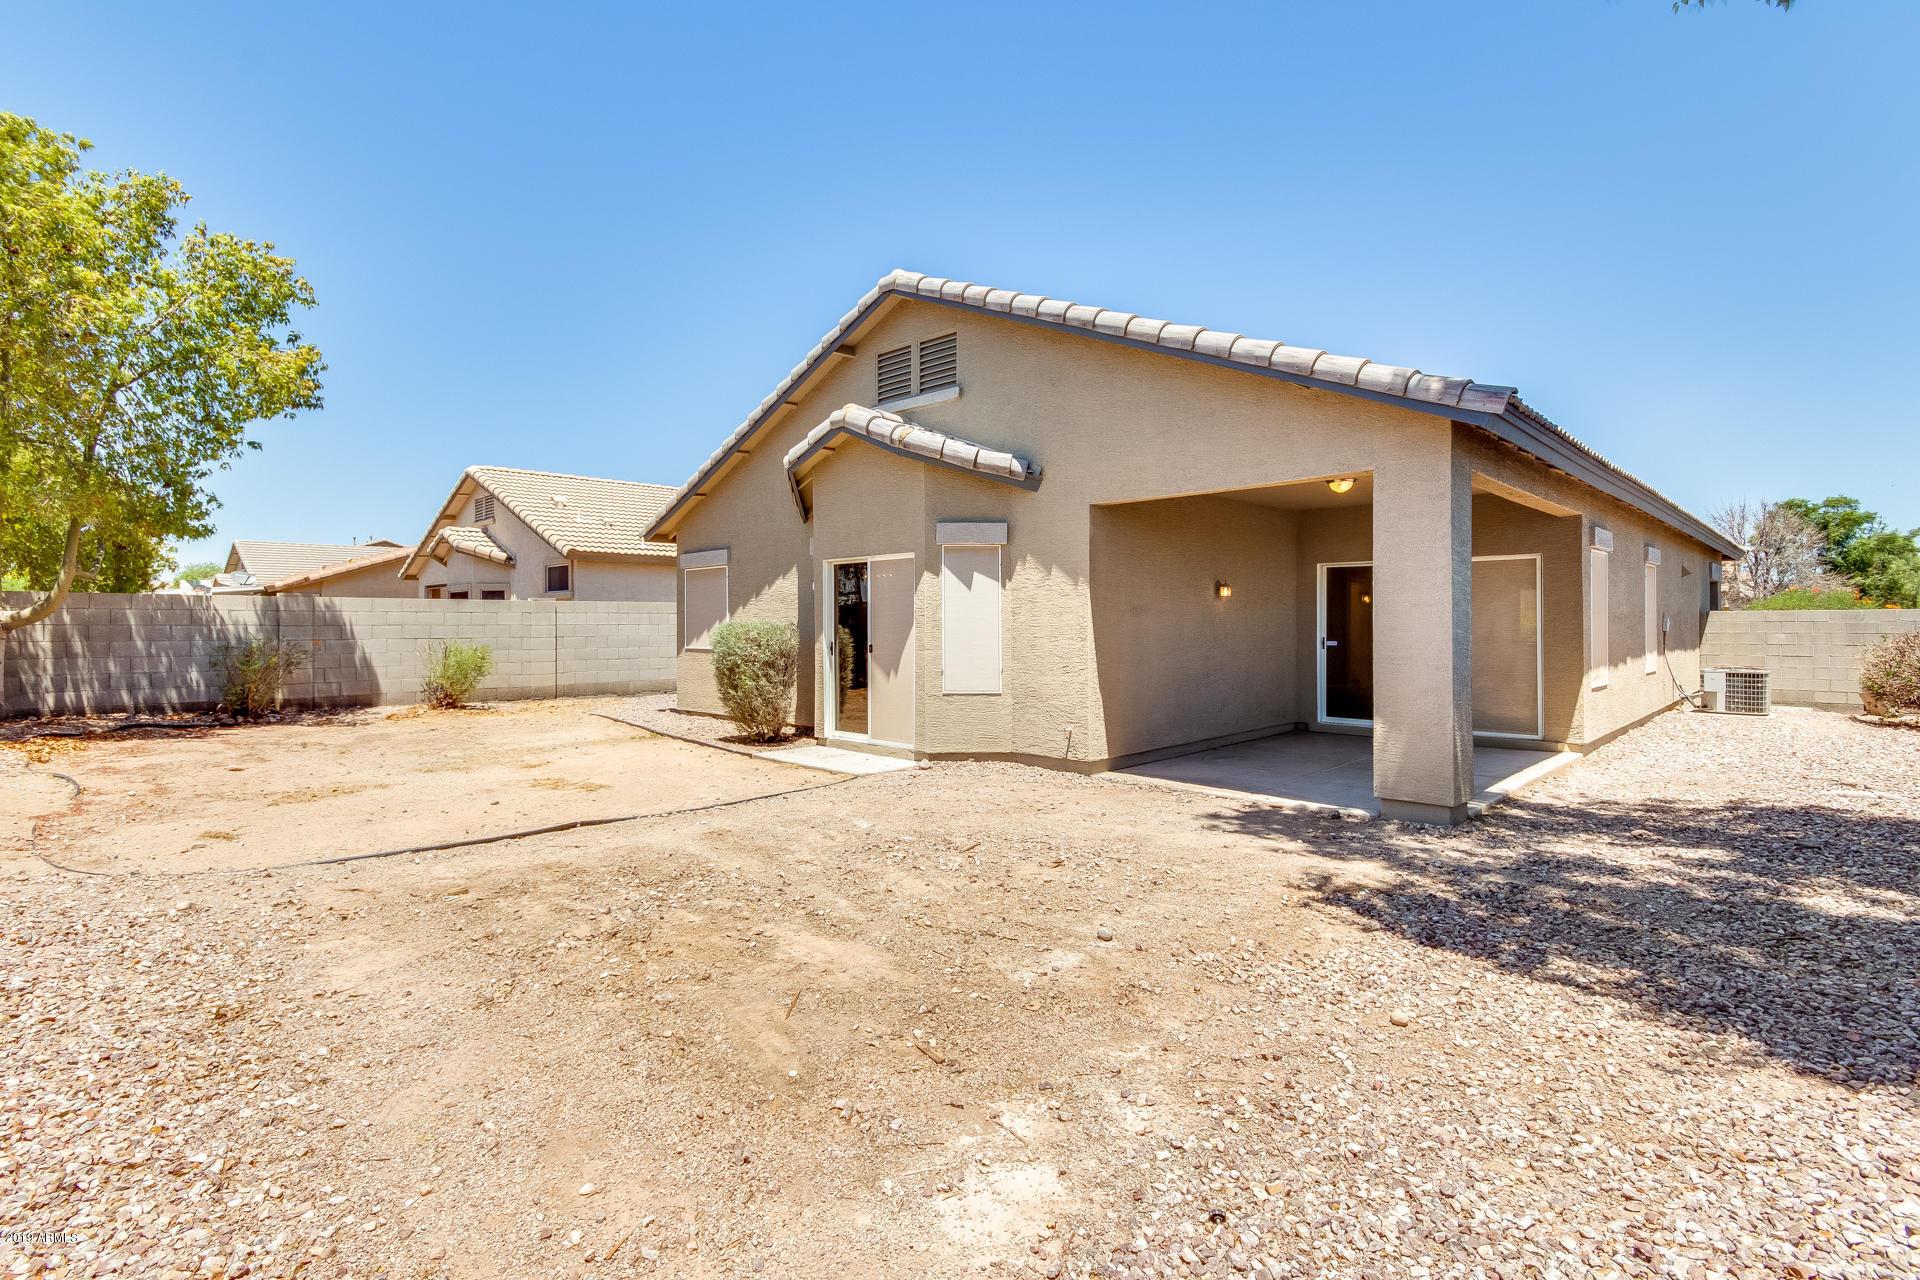 MLS 5955147 20 S 126TH Avenue, Avondale, AZ 85323 Avondale AZ Golf